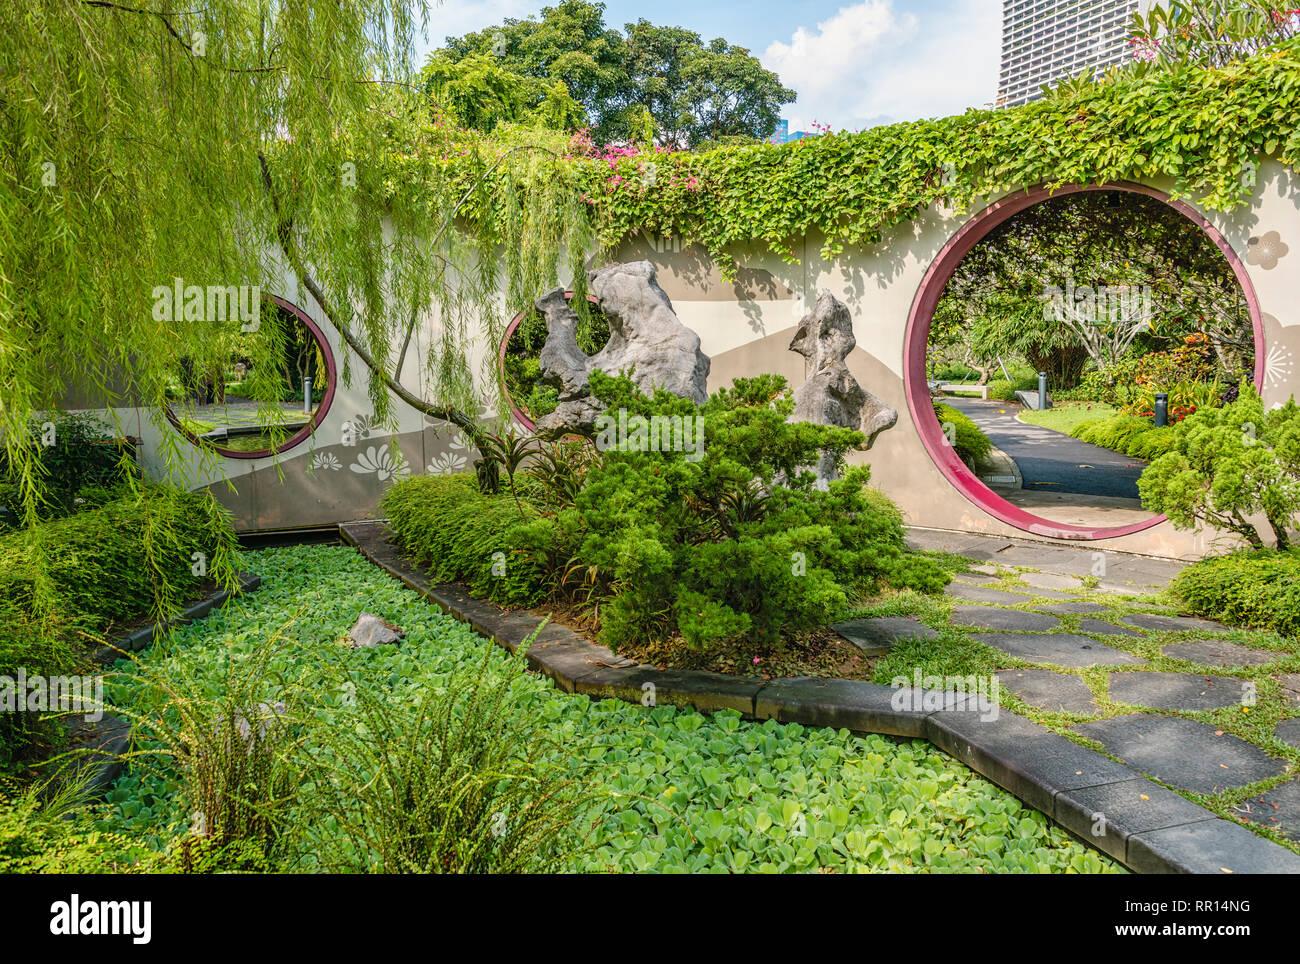 Chinese Garden At Gardens By The Bay Singapore Chinesischer